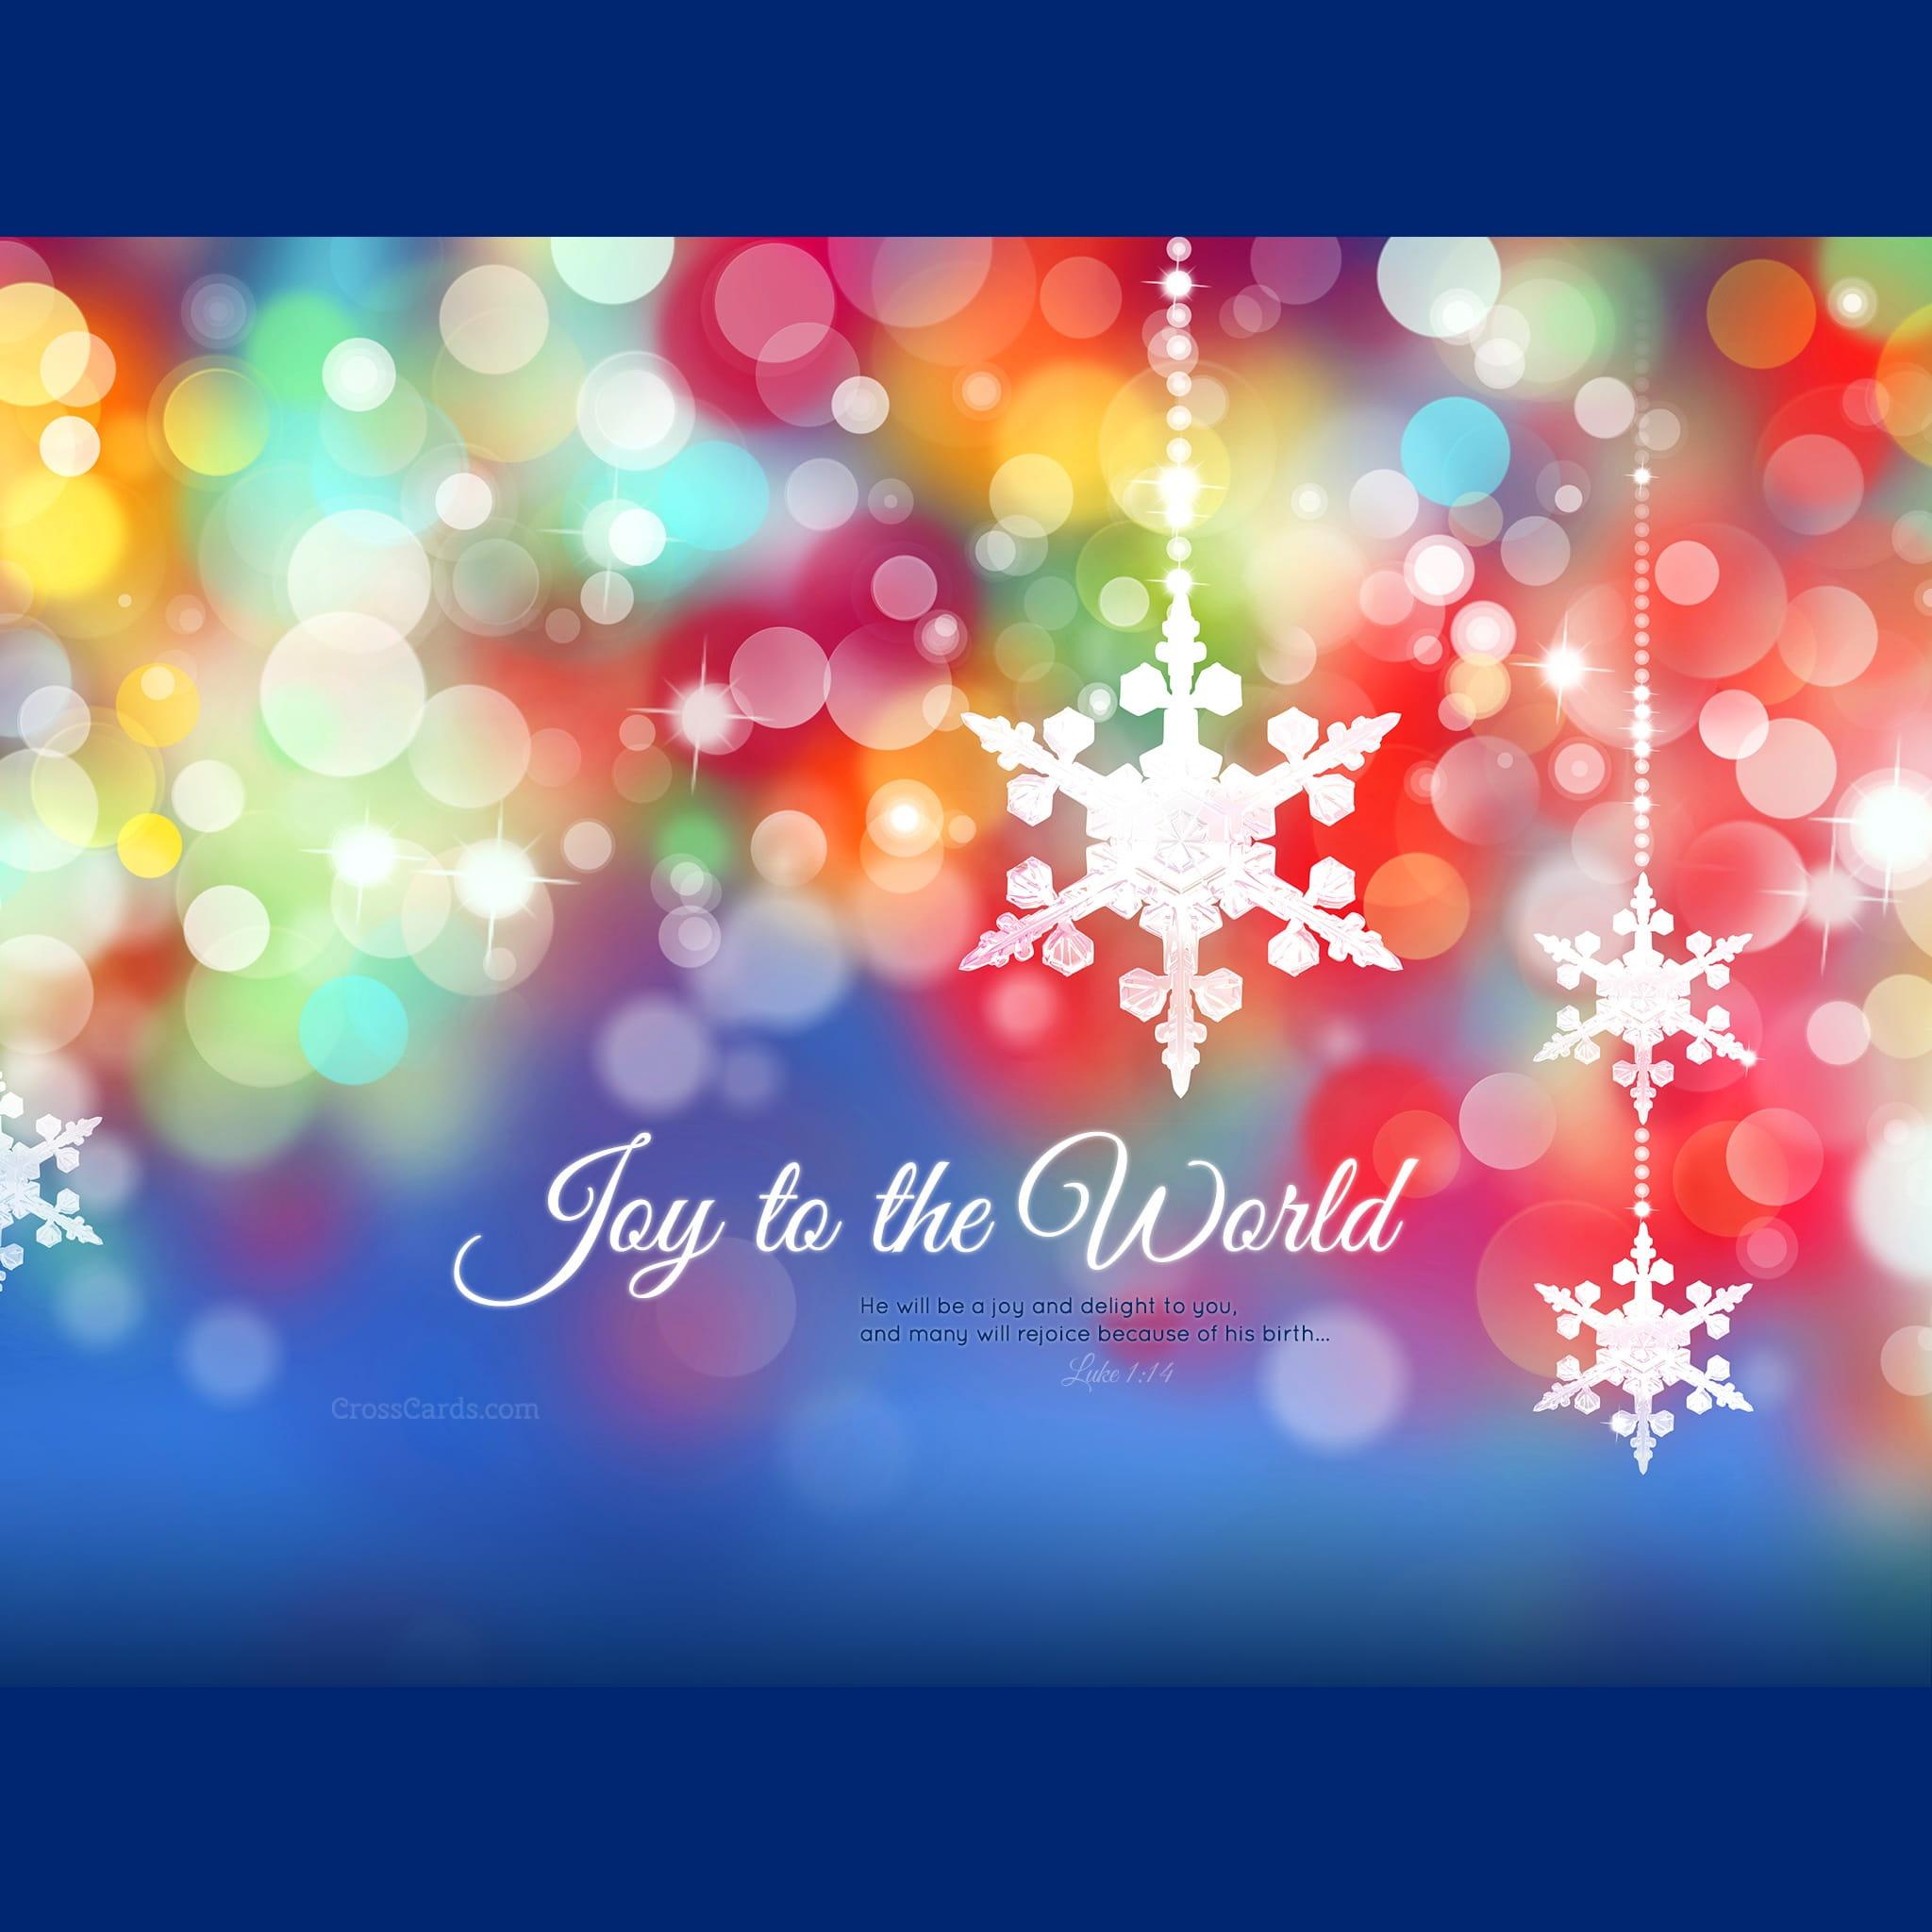 december 2015 - joy to the world desktop calendar- free december